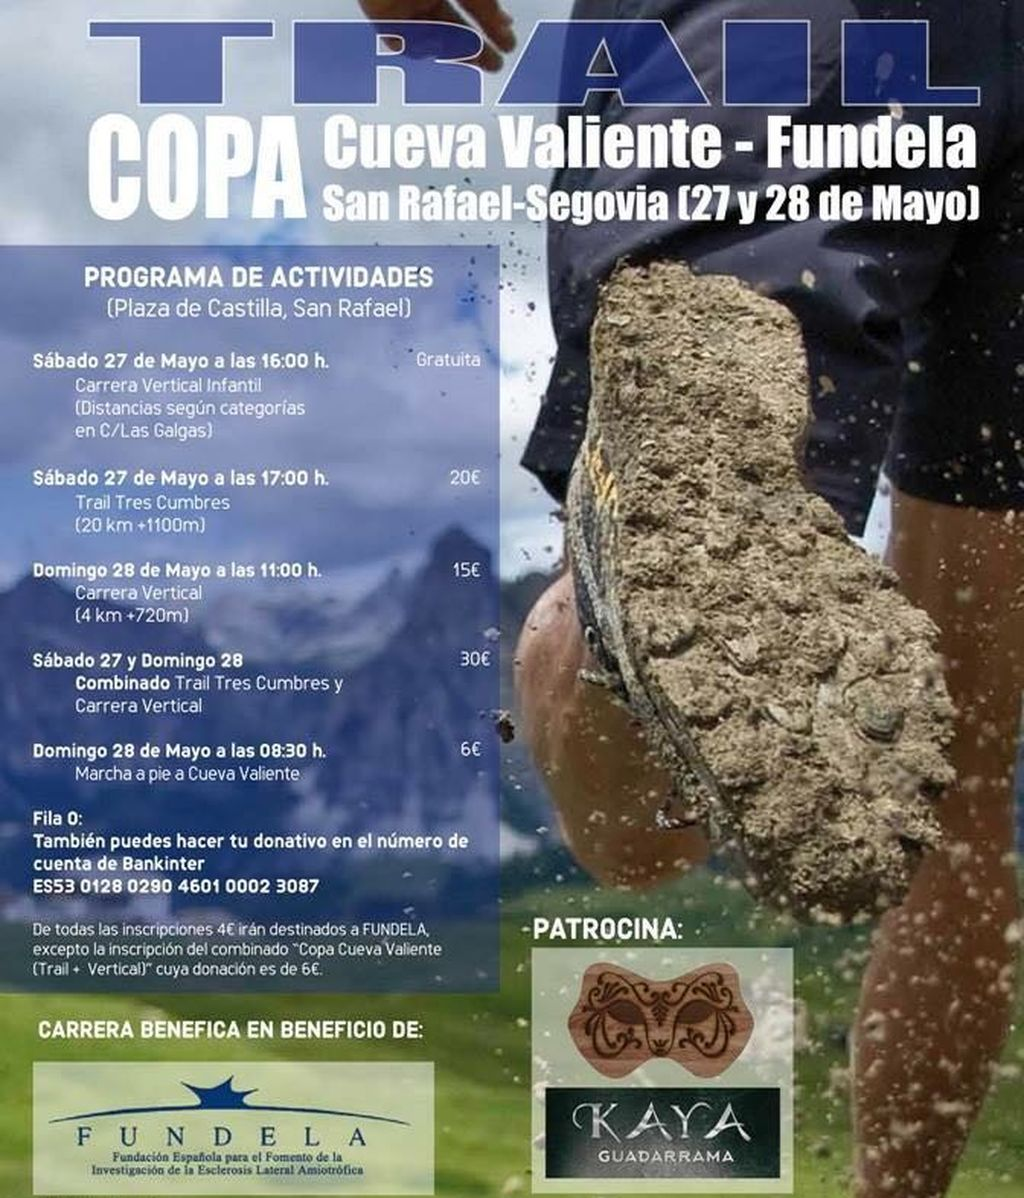 Trail copa Cueva Valiente-Fundela